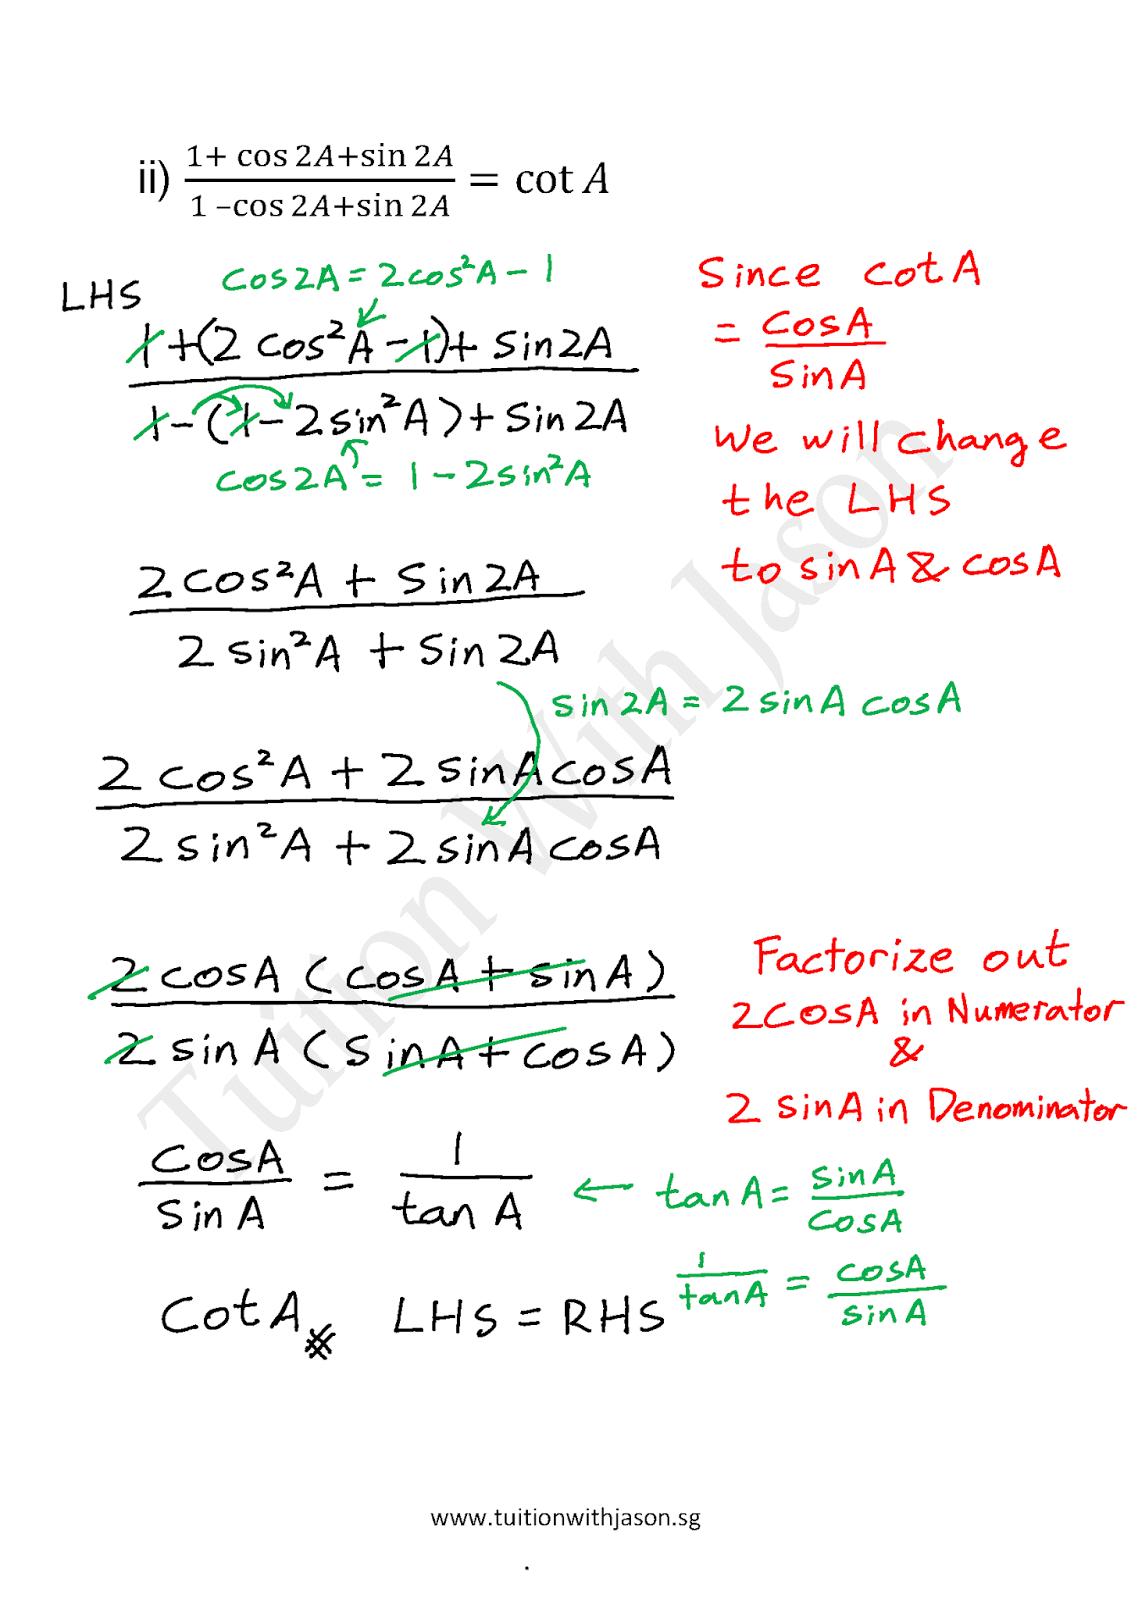 A-Math - Trigonometry - Trigonometric Identities (3)